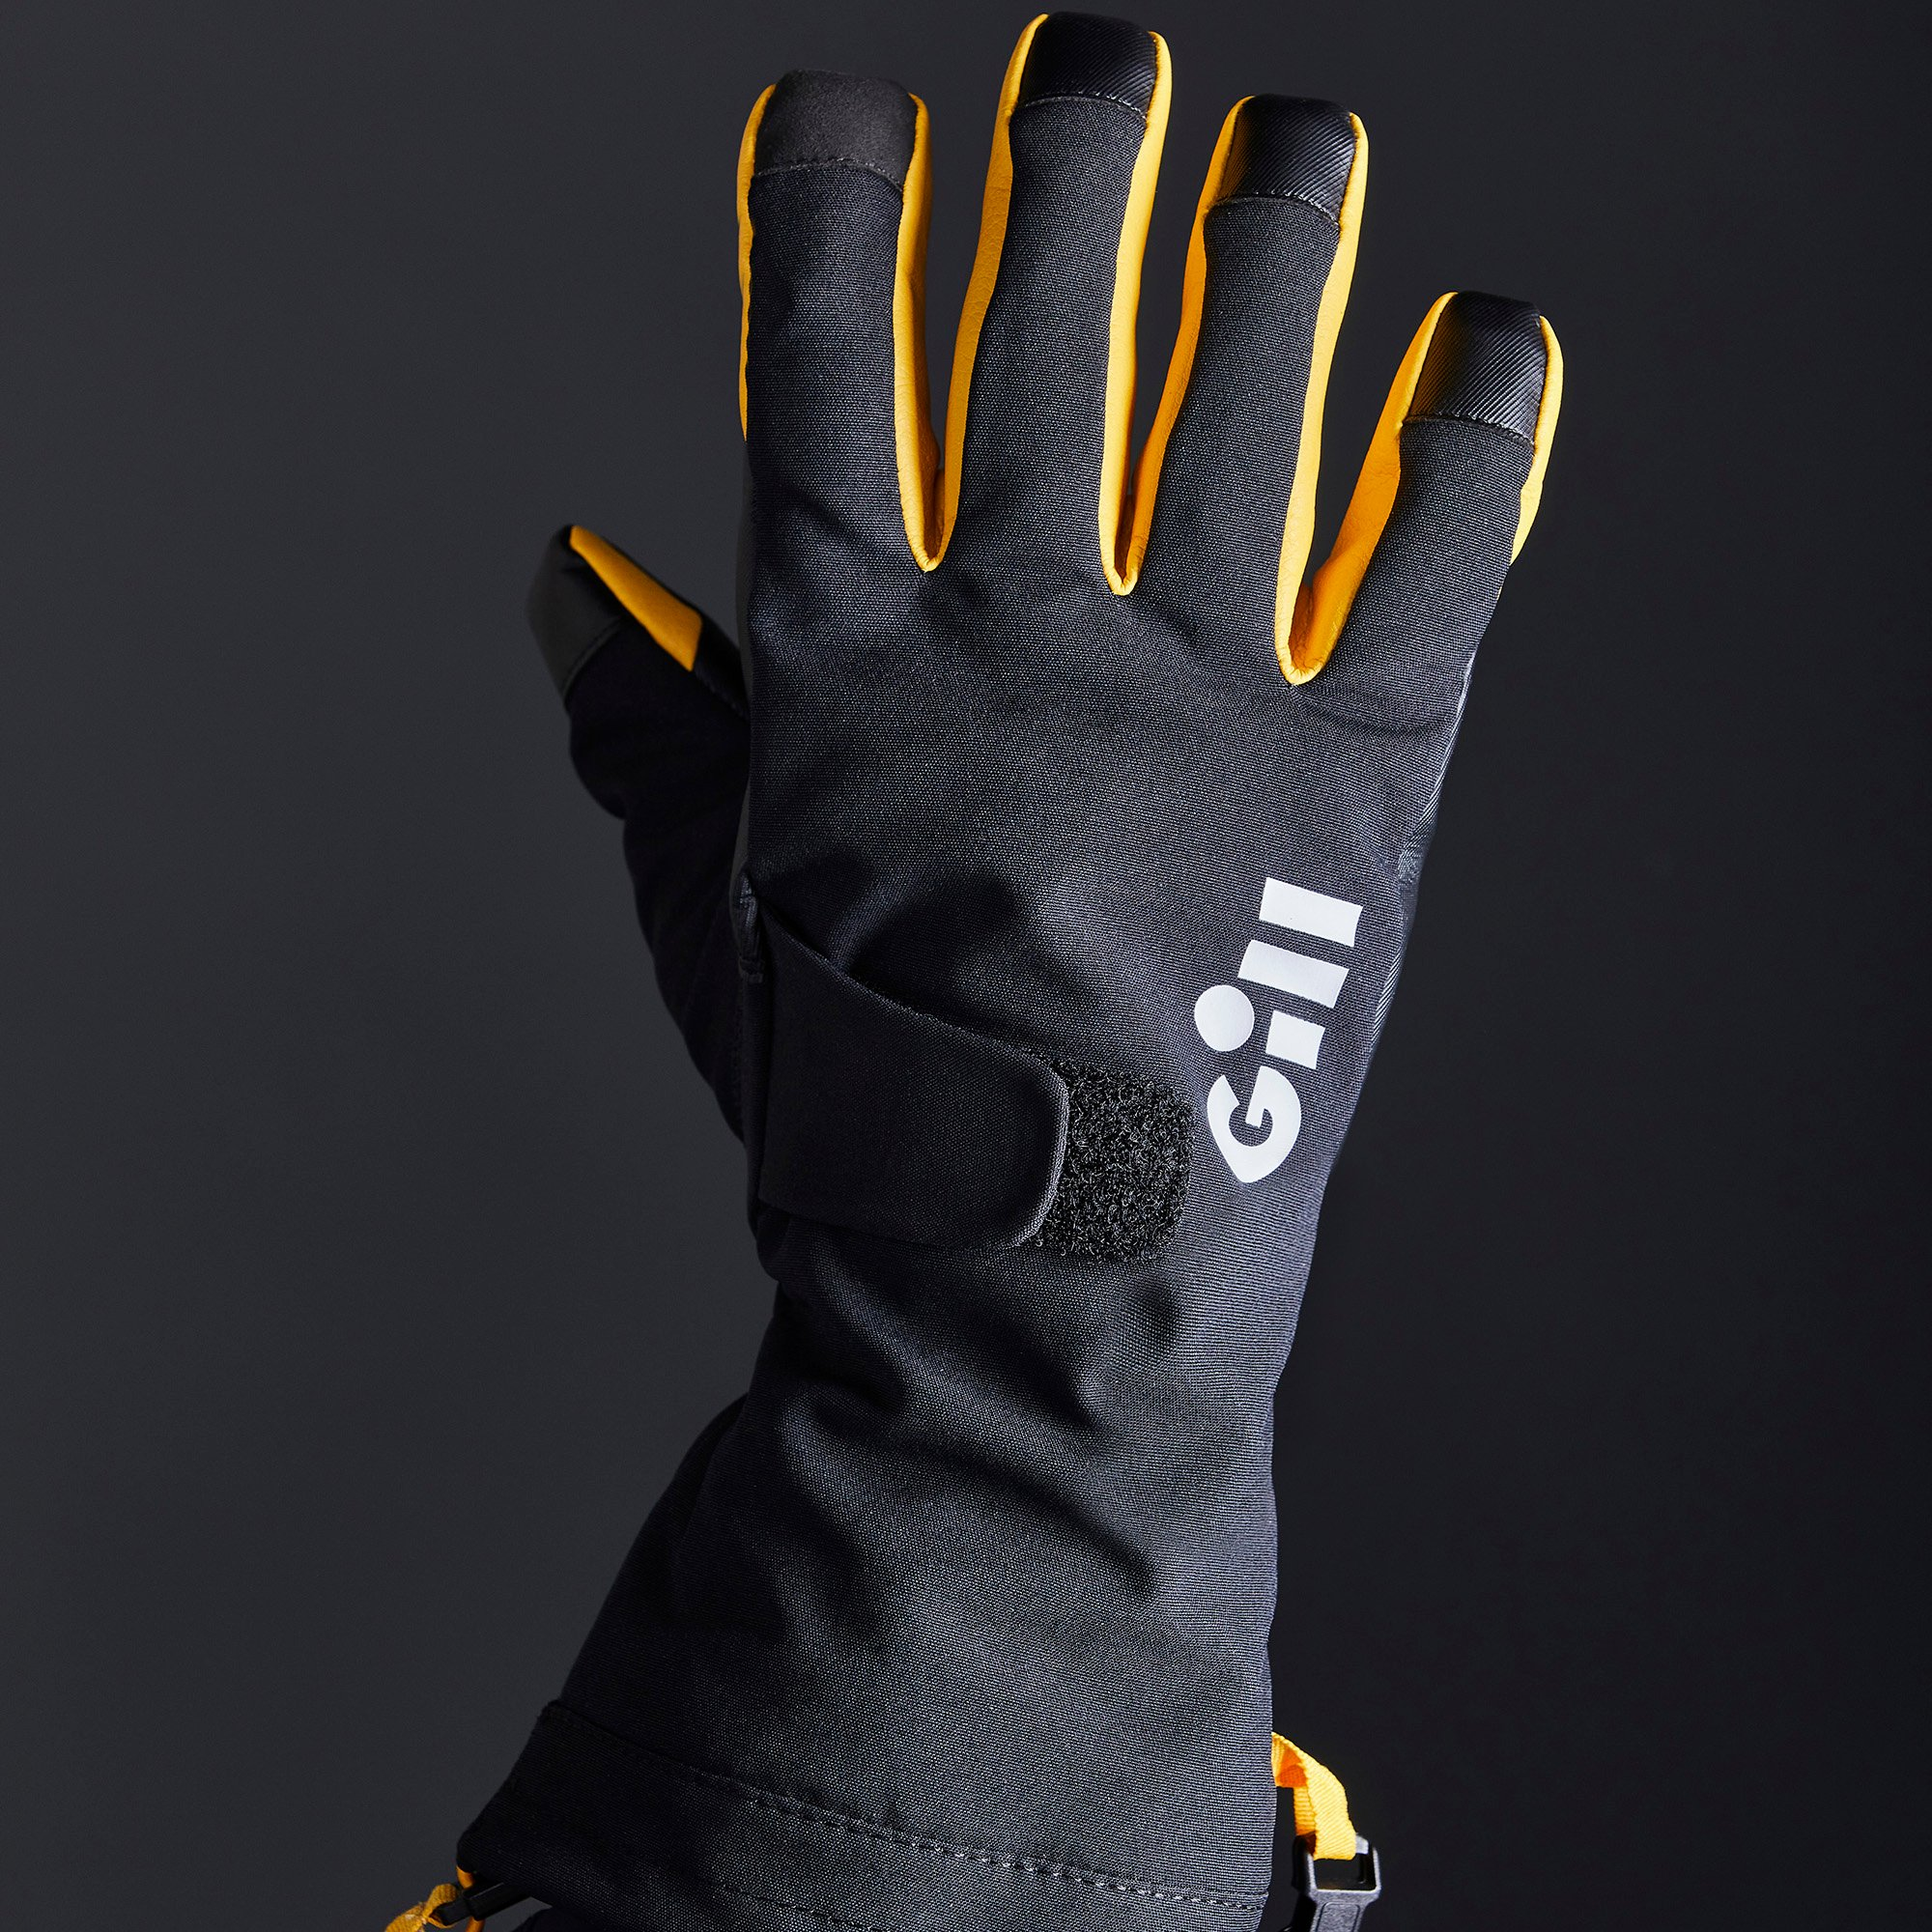 Helmsman-Handschuhe - 7805-BLK01-MODEL.jpg